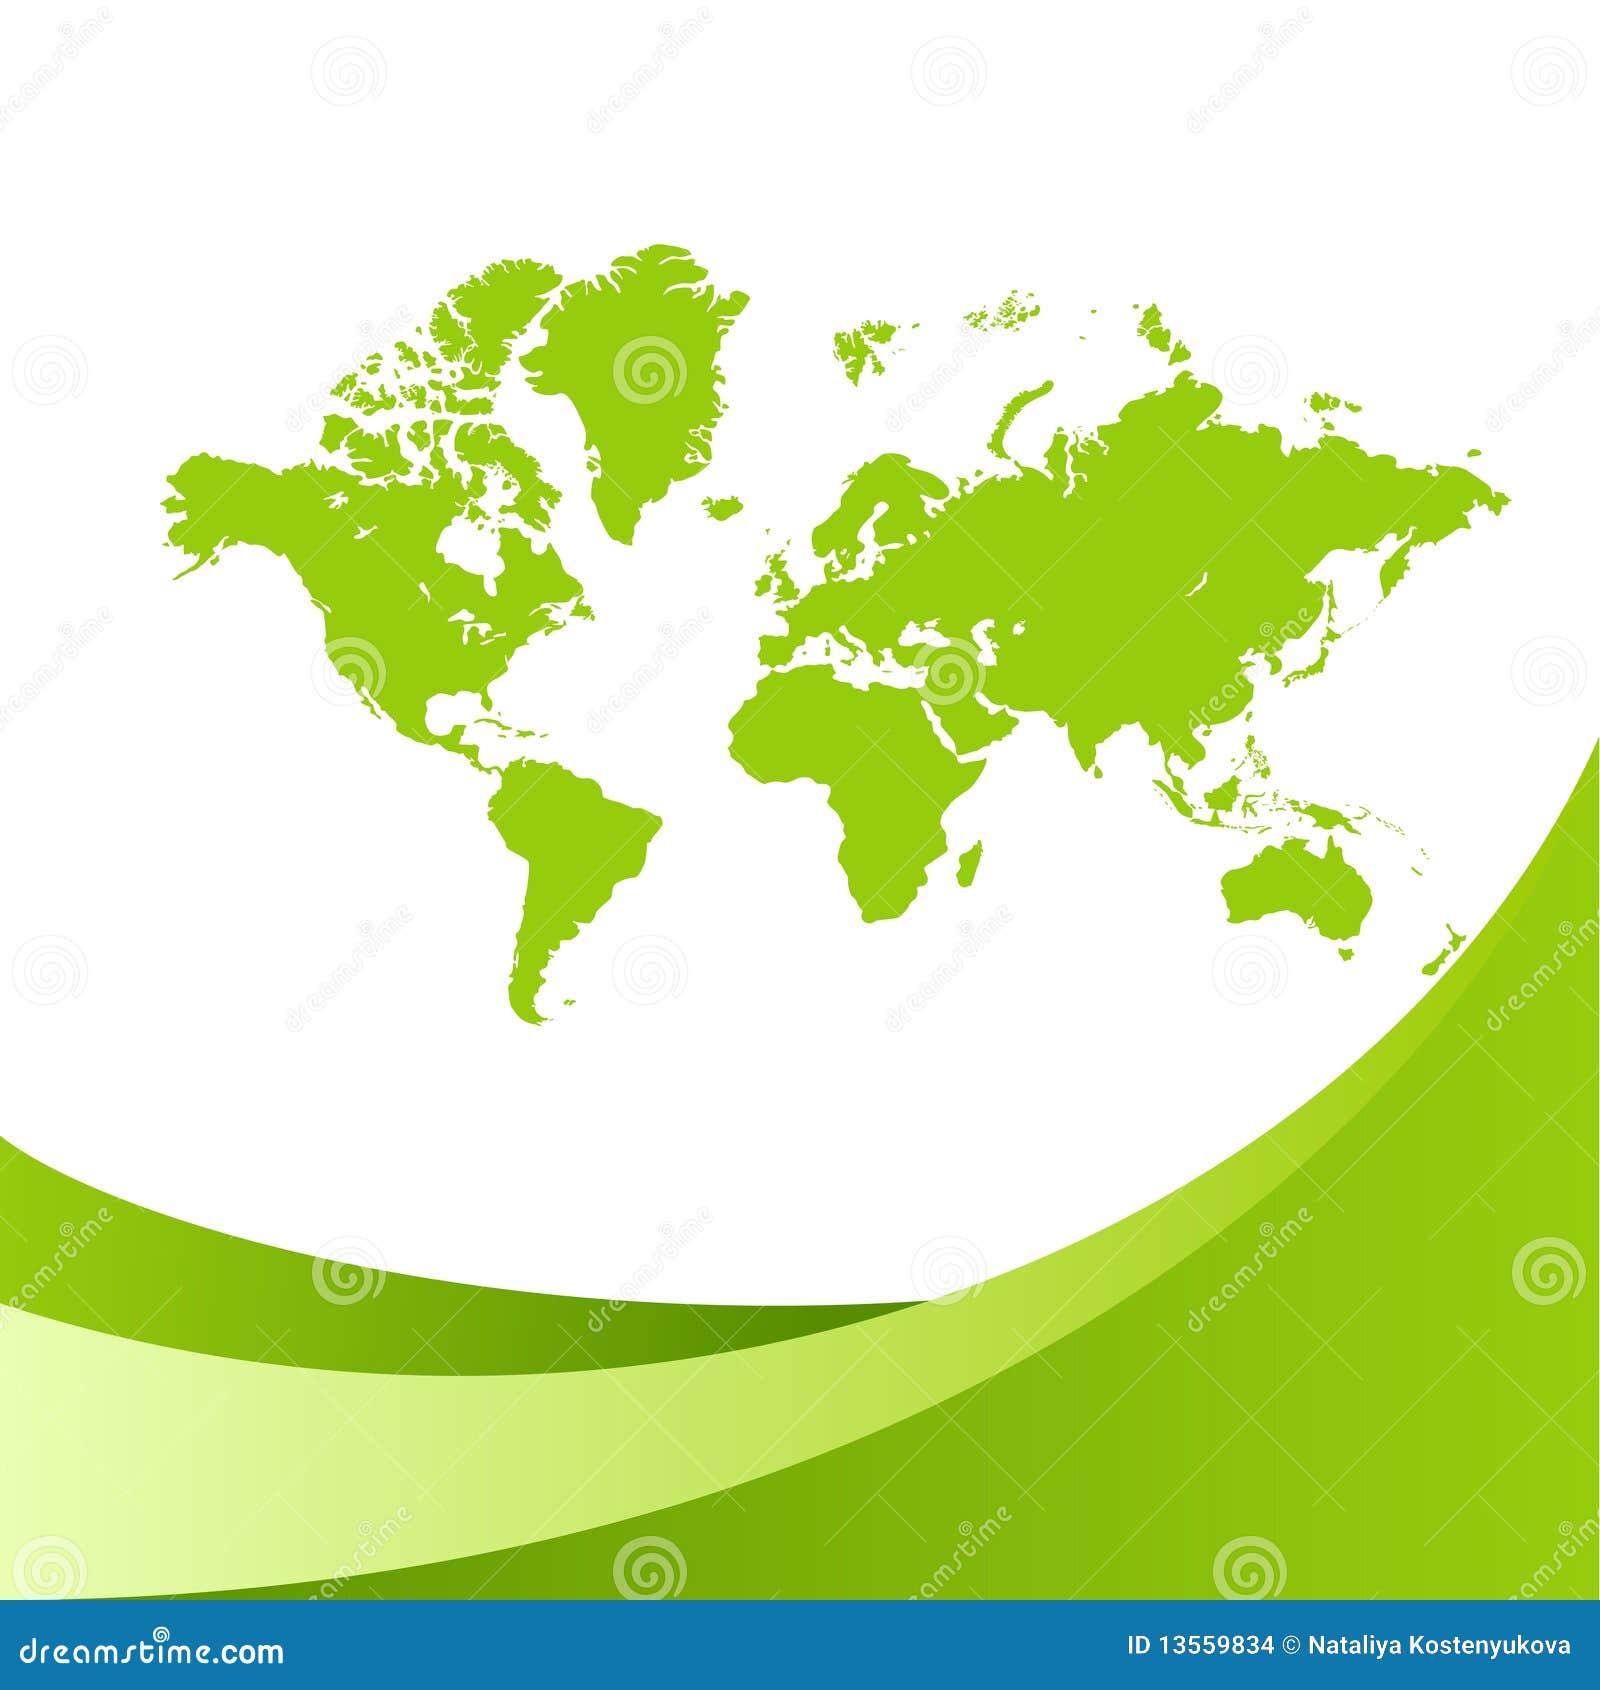 World map green background stock vector. Illustration of